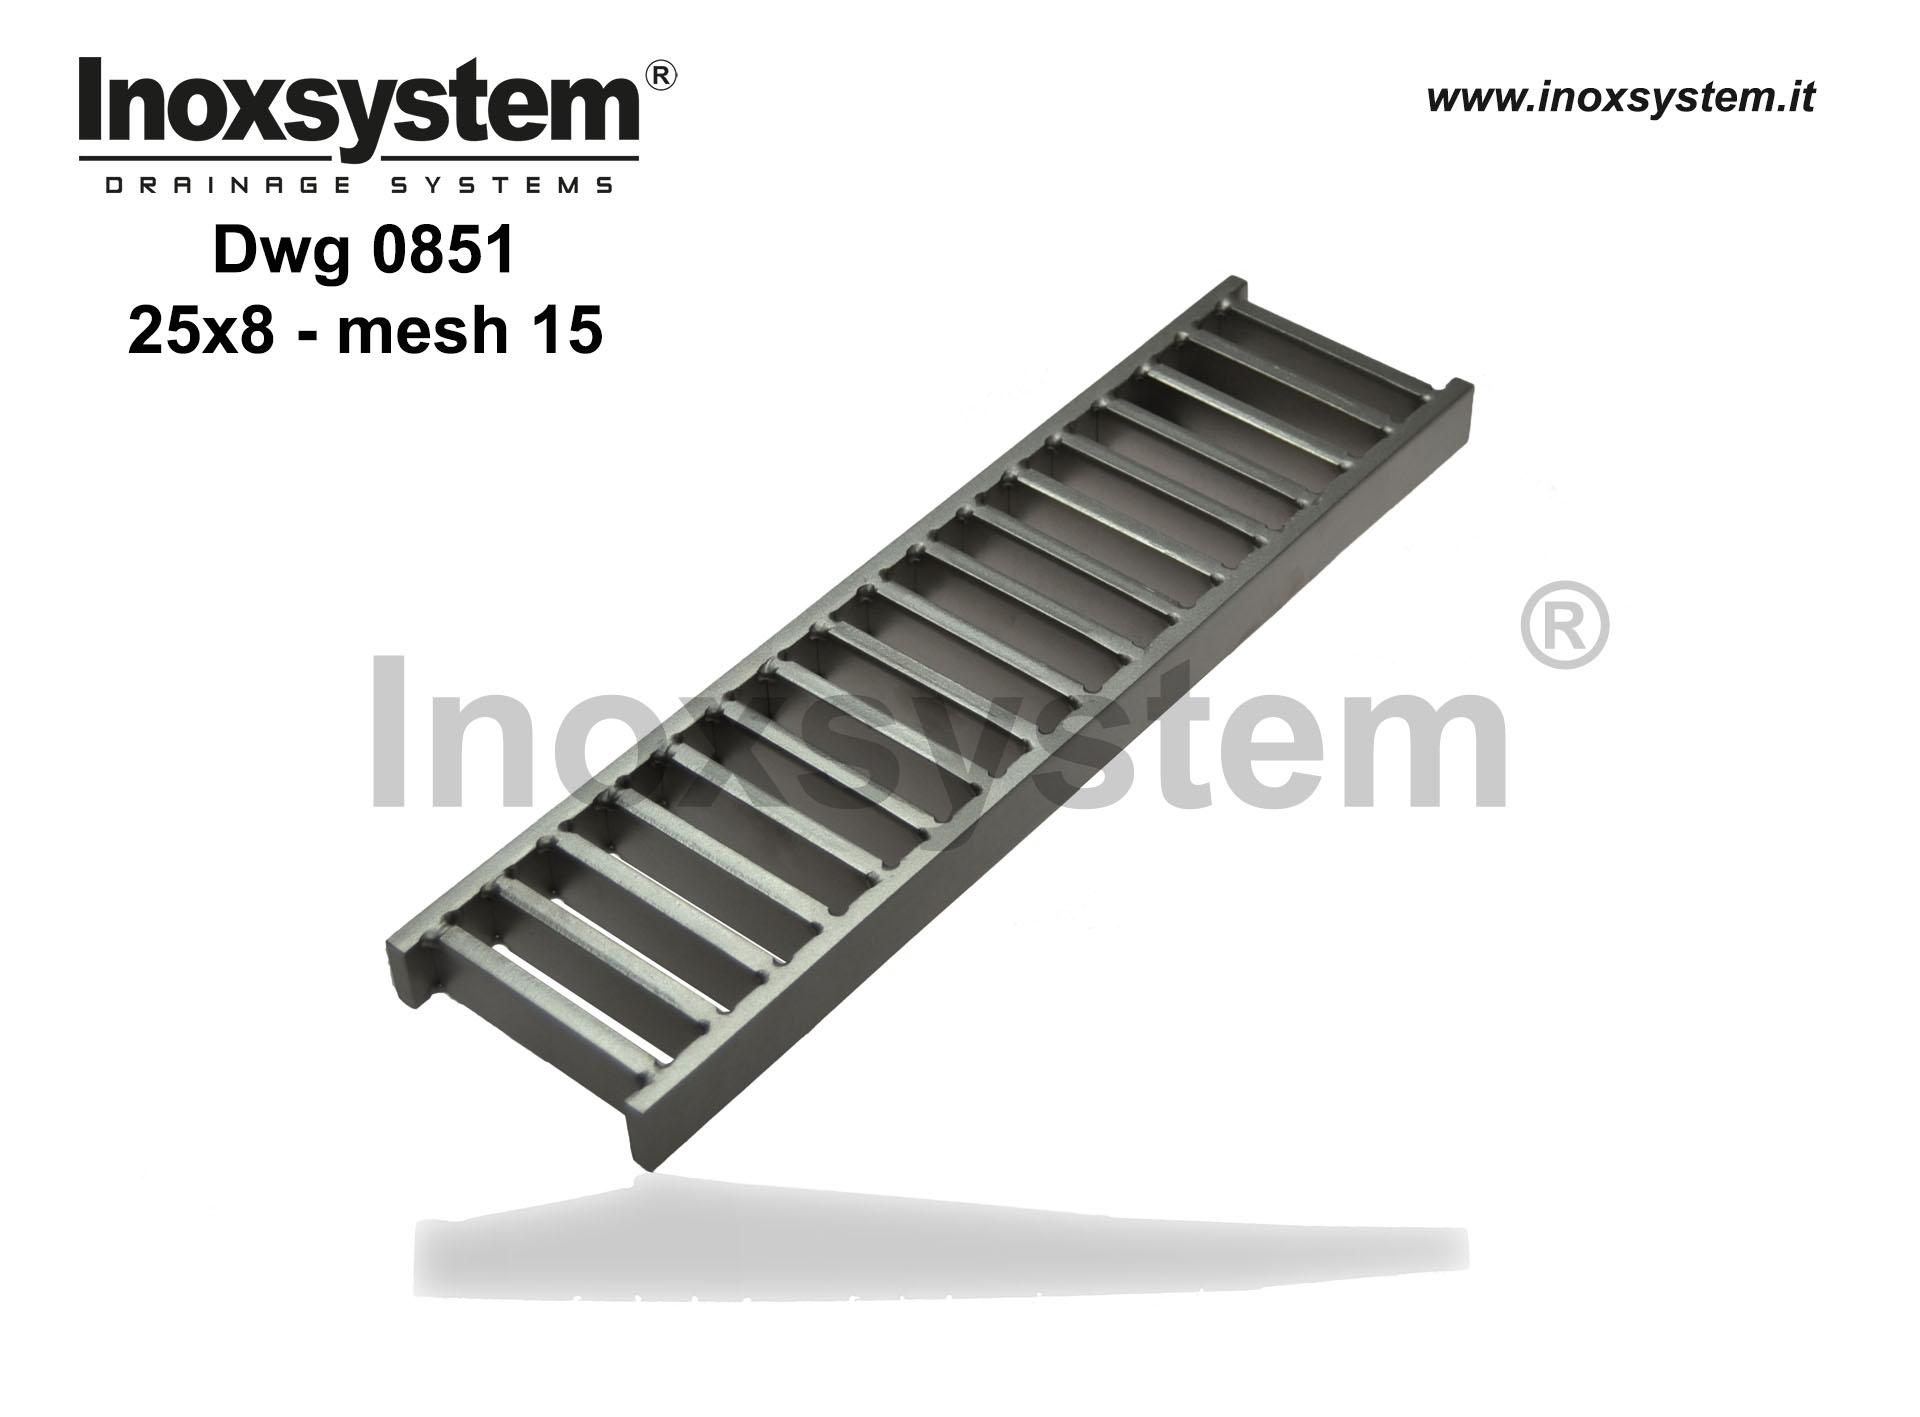 Heavy duty ladder gratings flat bars 25x8 mesh width 15 in stainless steel